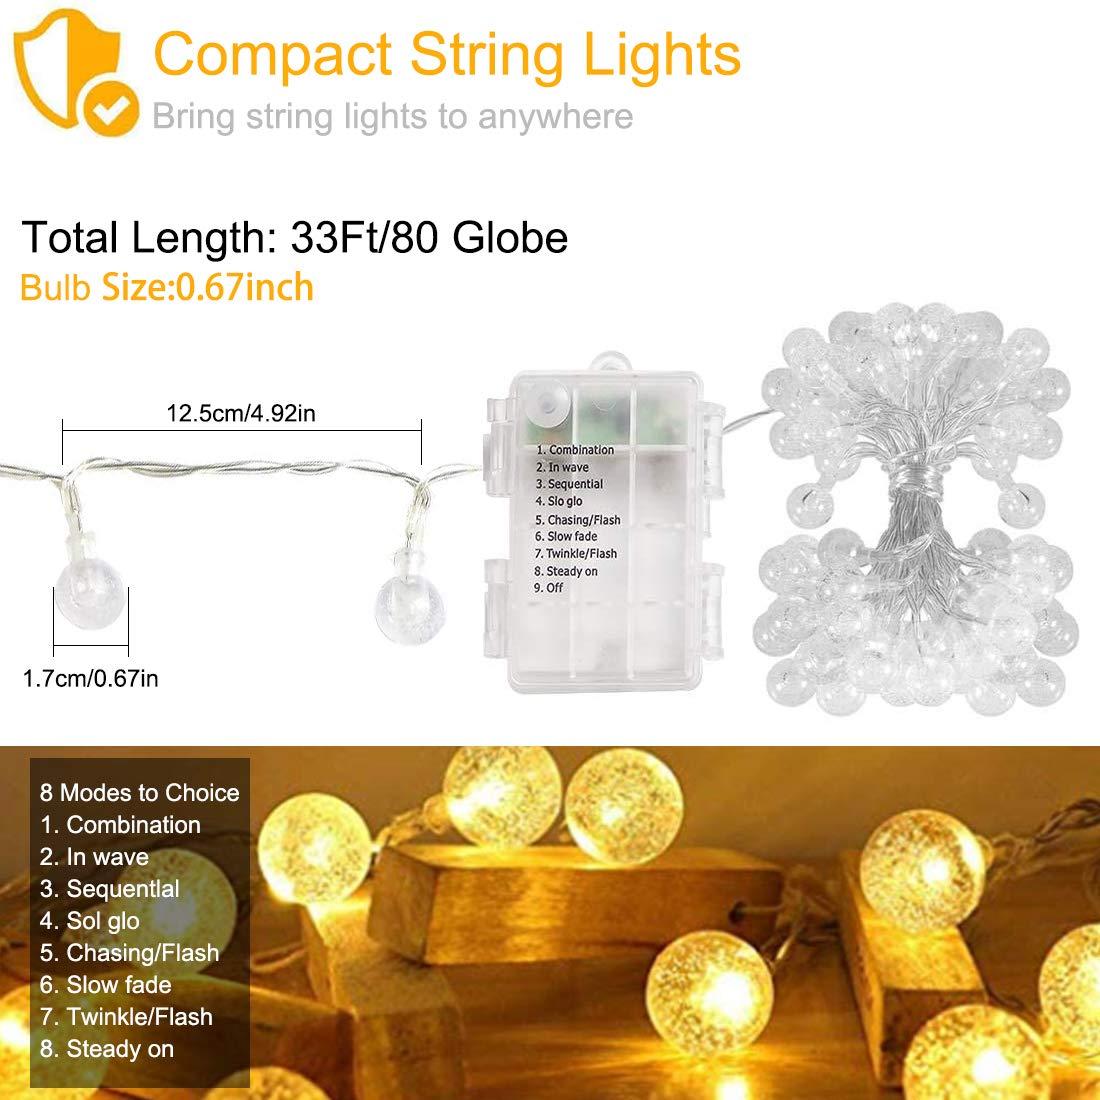 IP45 Waterproof Patio Lights 25FT G40 LED Globe String Lights with 12+1pcs Shatterproof Bulbs,1 Watt Dimmable 2700K Bomcosy Outdoor String Lights 12 X E12 Socket